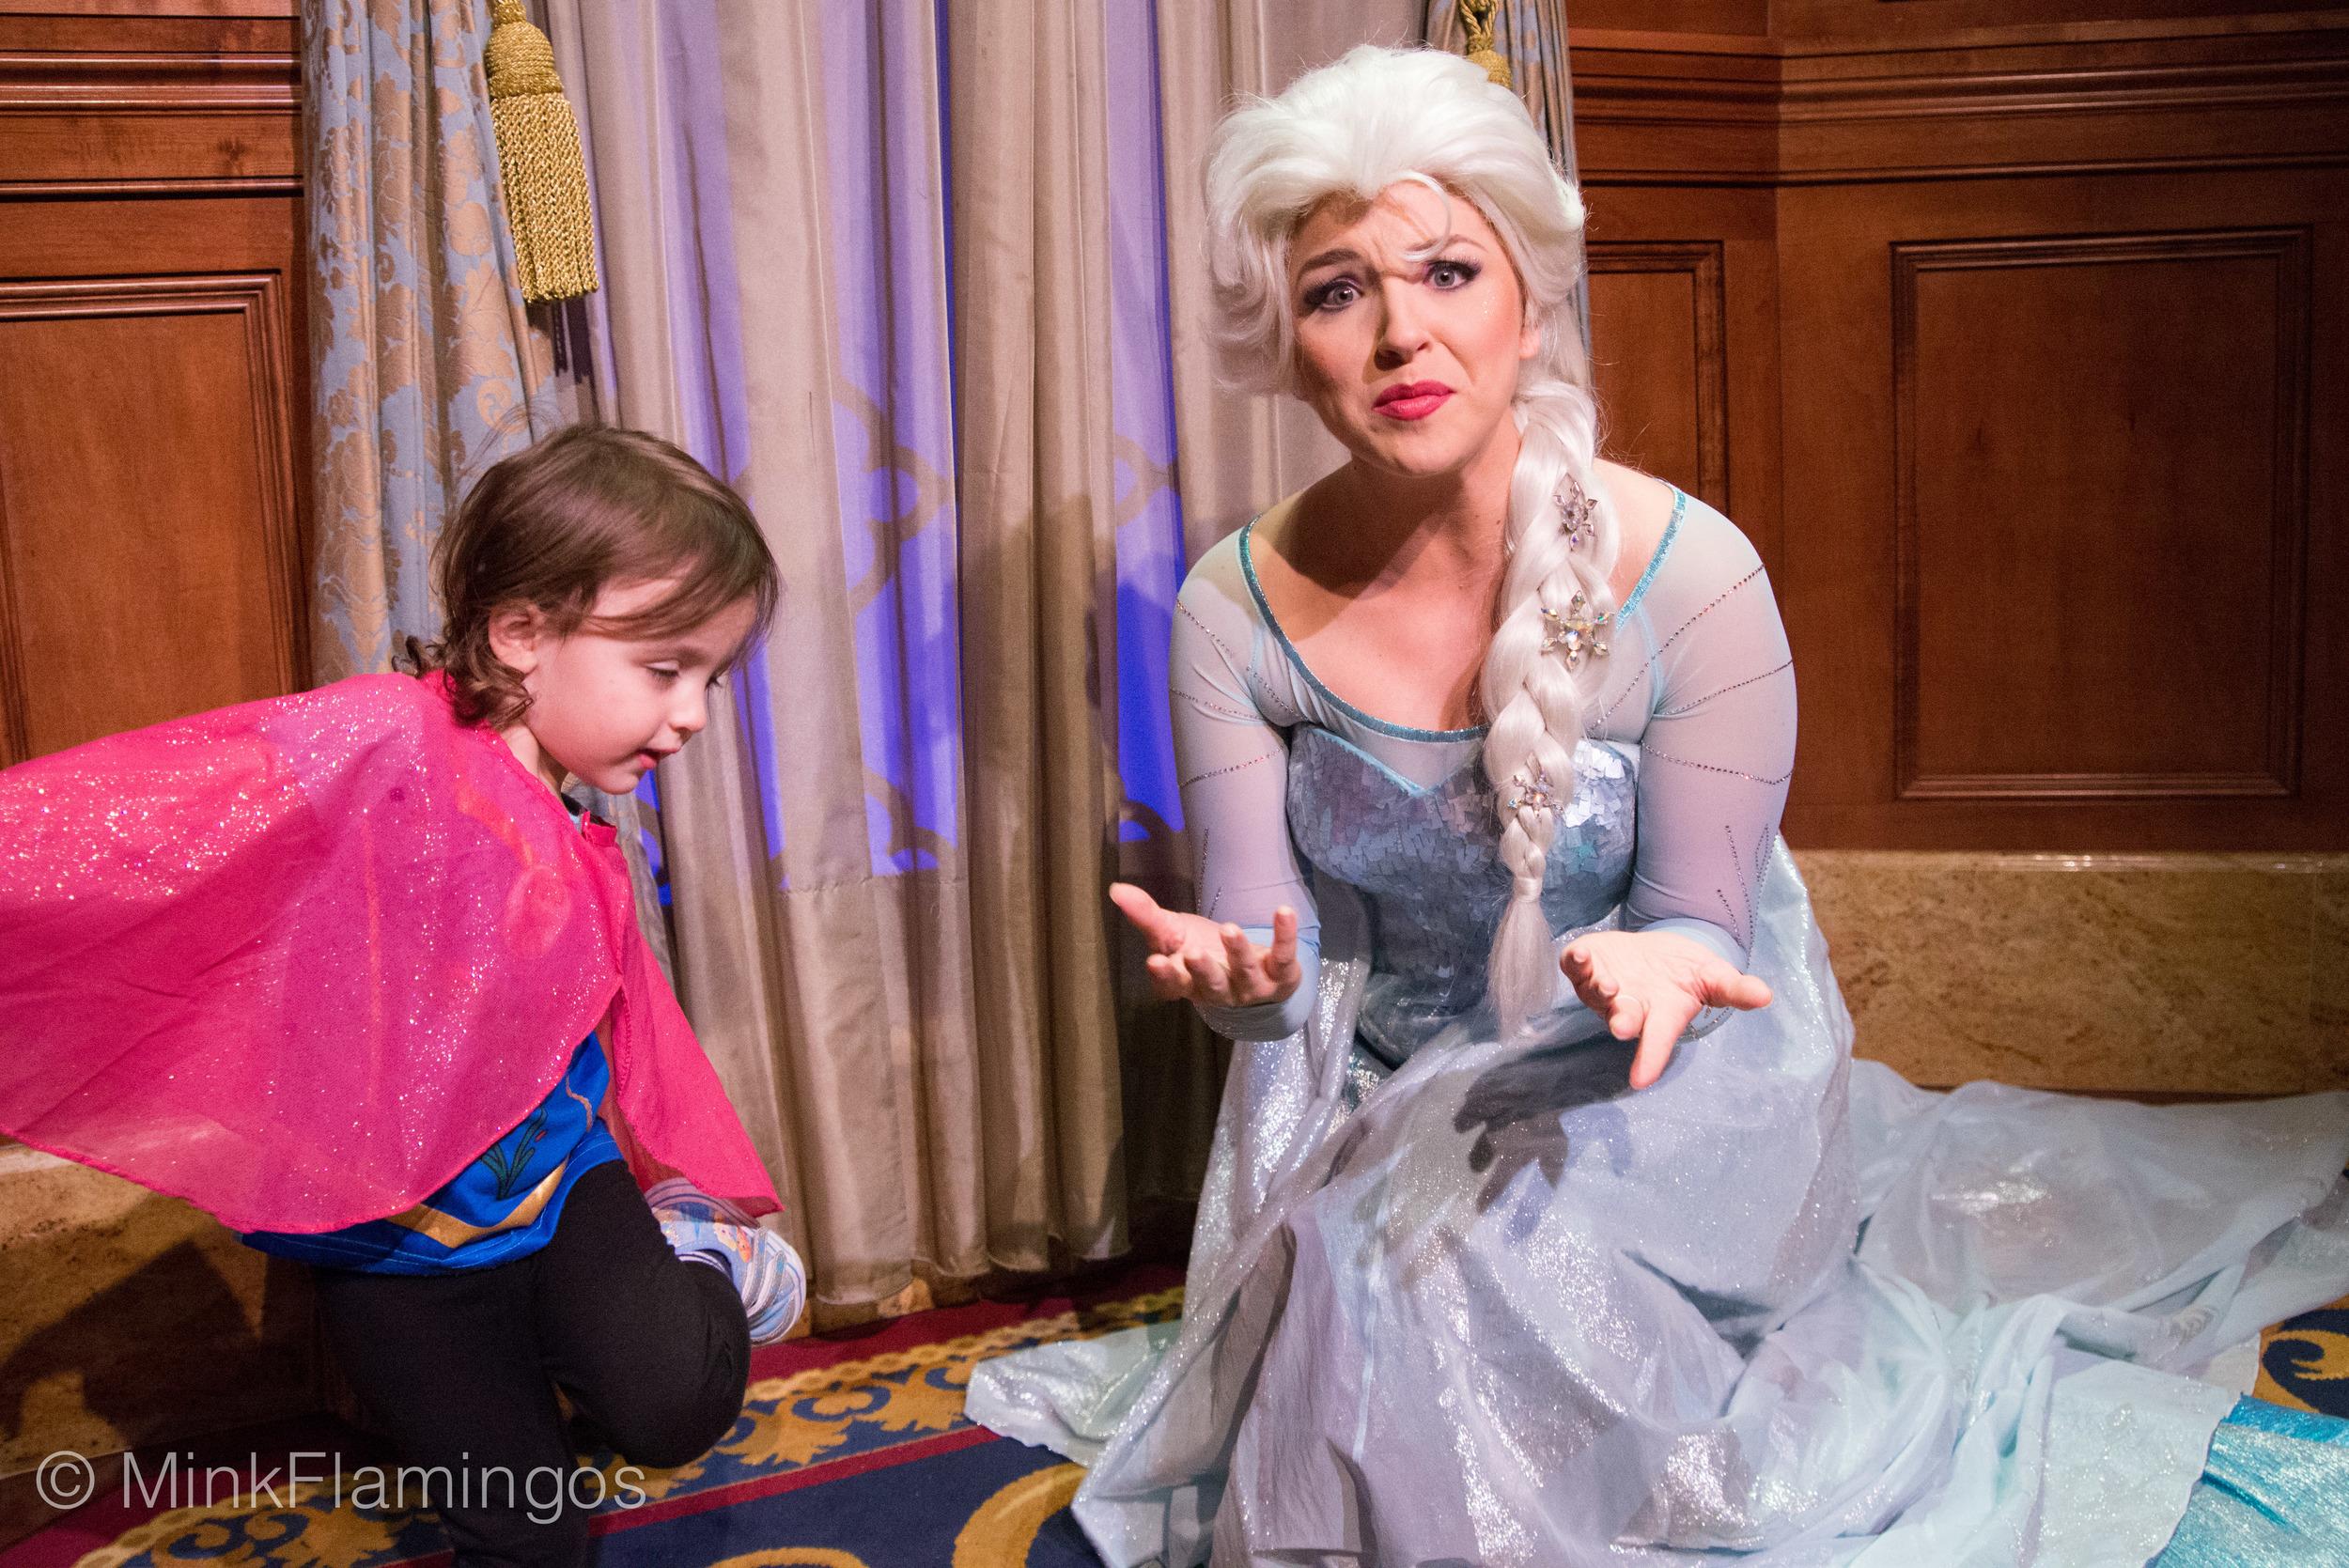 Elsa throws some reindeer sass